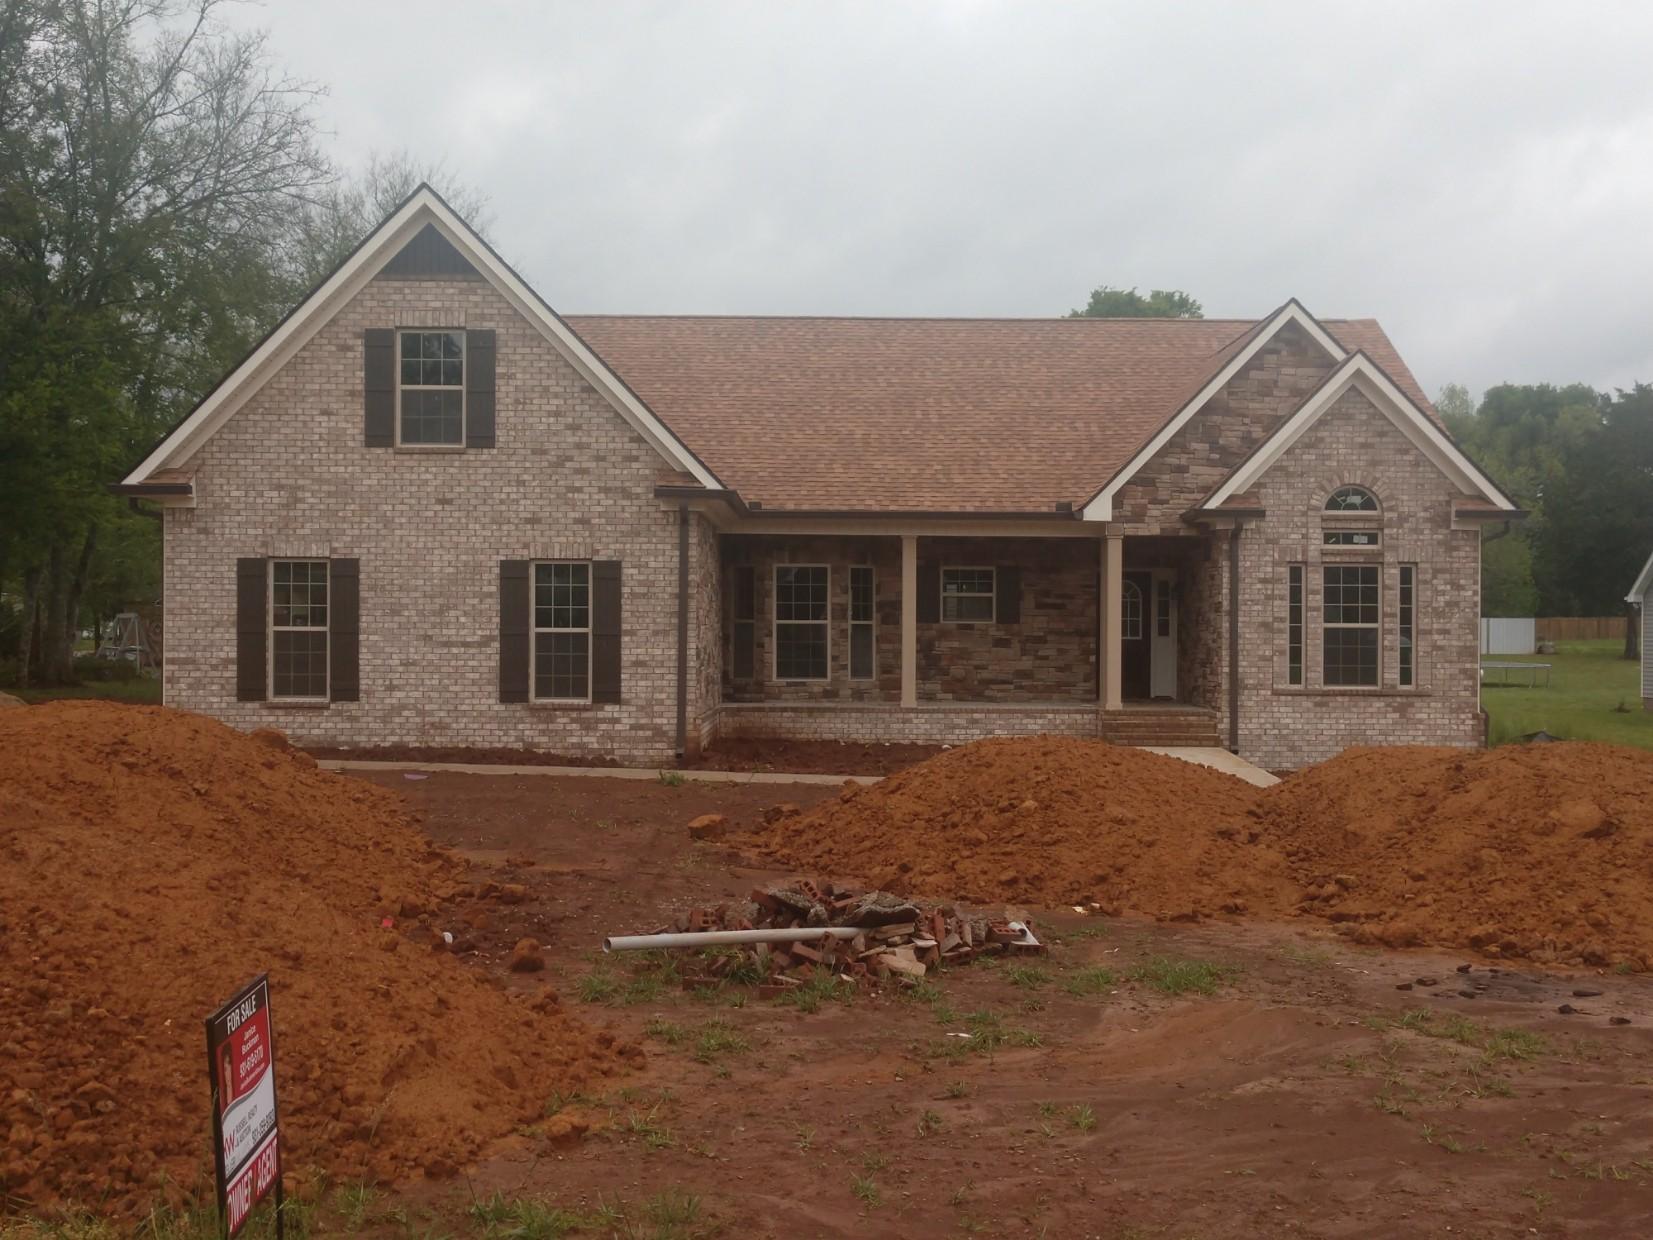 1422 Alyssa Dr Property Photo - Chapel Hill, TN real estate listing